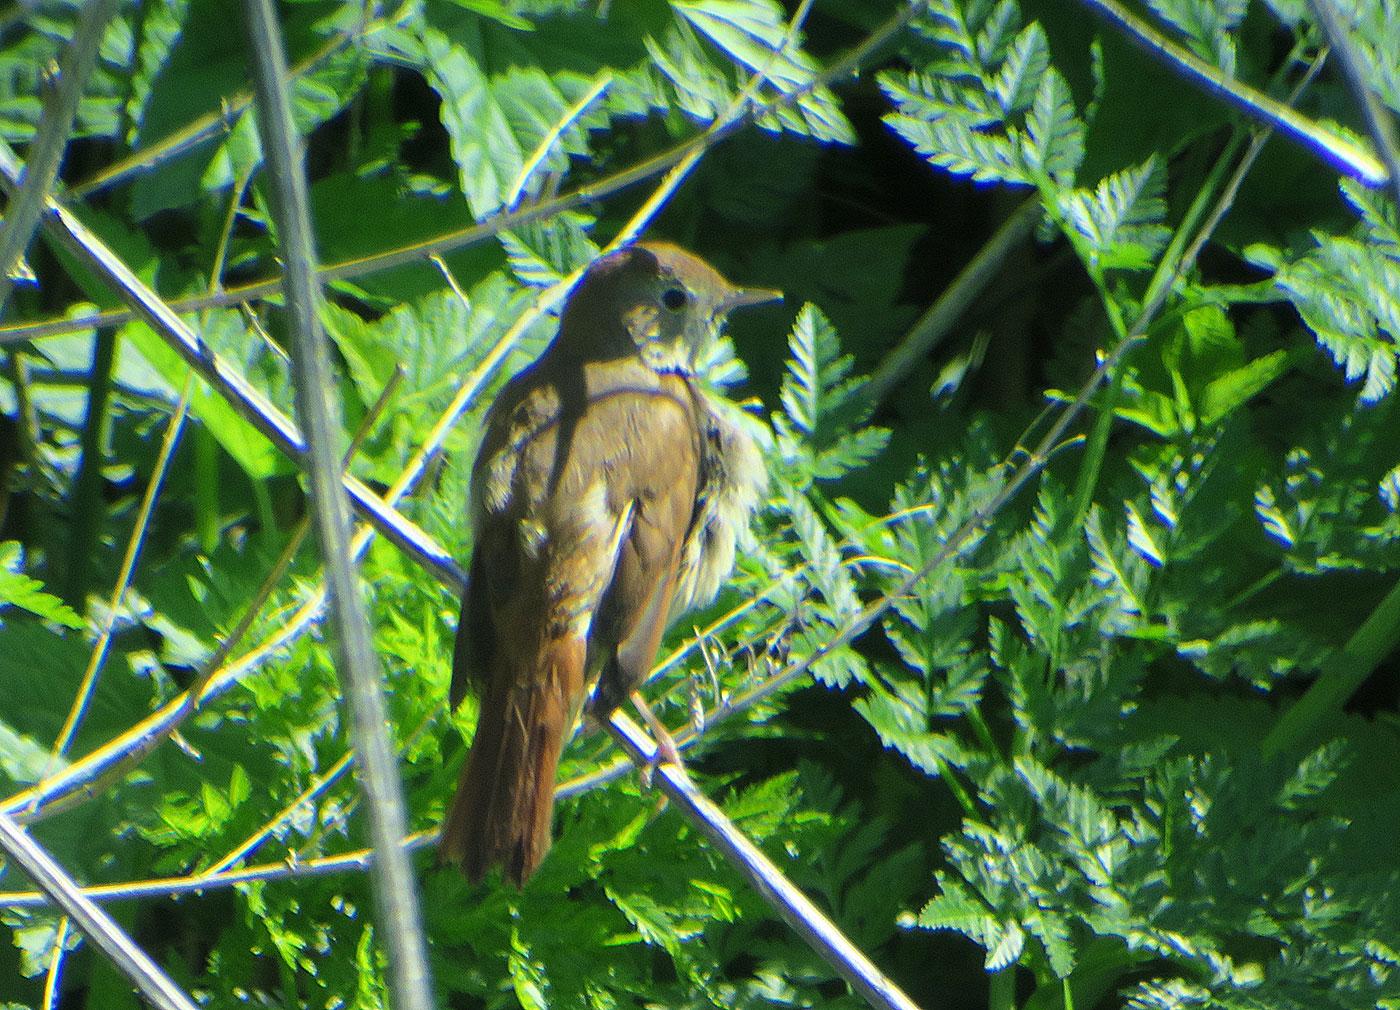 05_nachtigall_common-nightingale_hansag_2019-05-24_0902